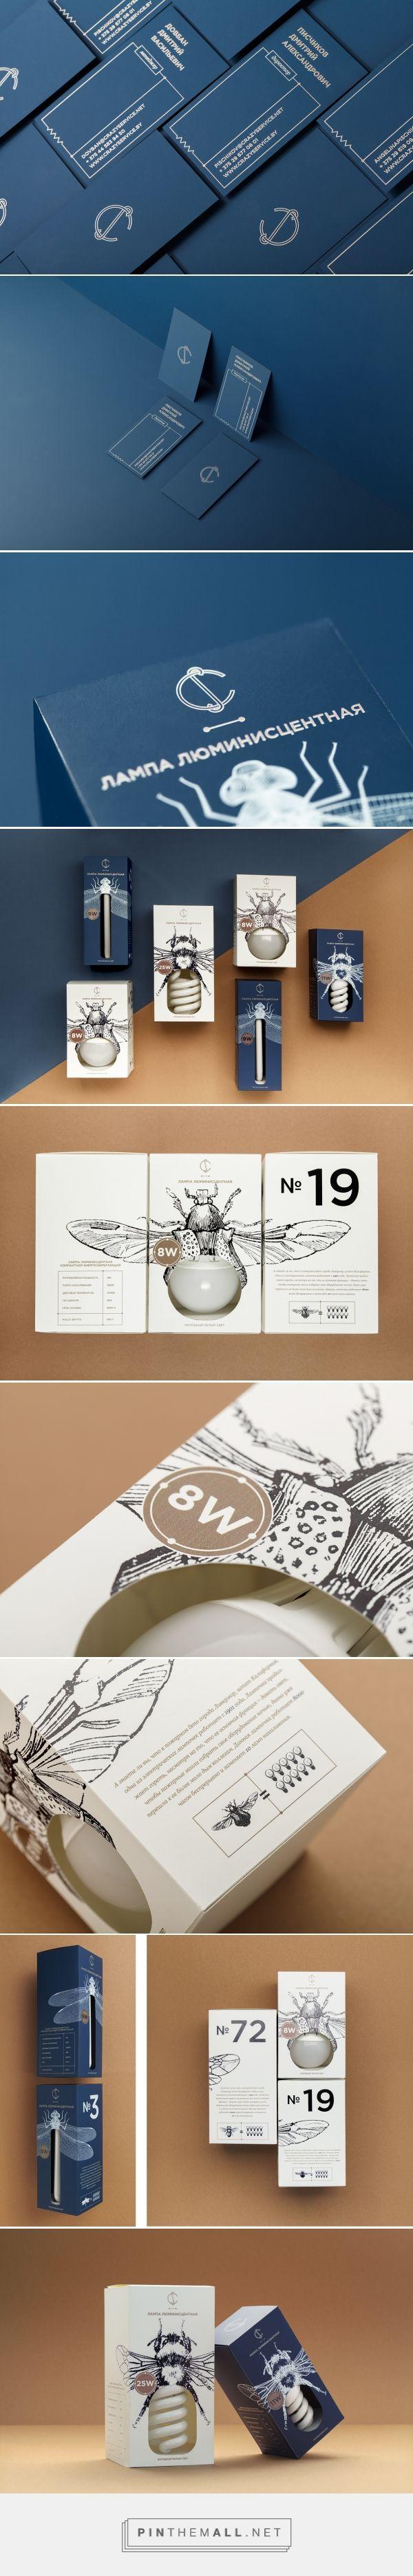 CS Electric light bulb packaging design by Angelina Pischikova (Belarus) - http://www.packagingoftheworld.com/2016/09/cs-electric.html